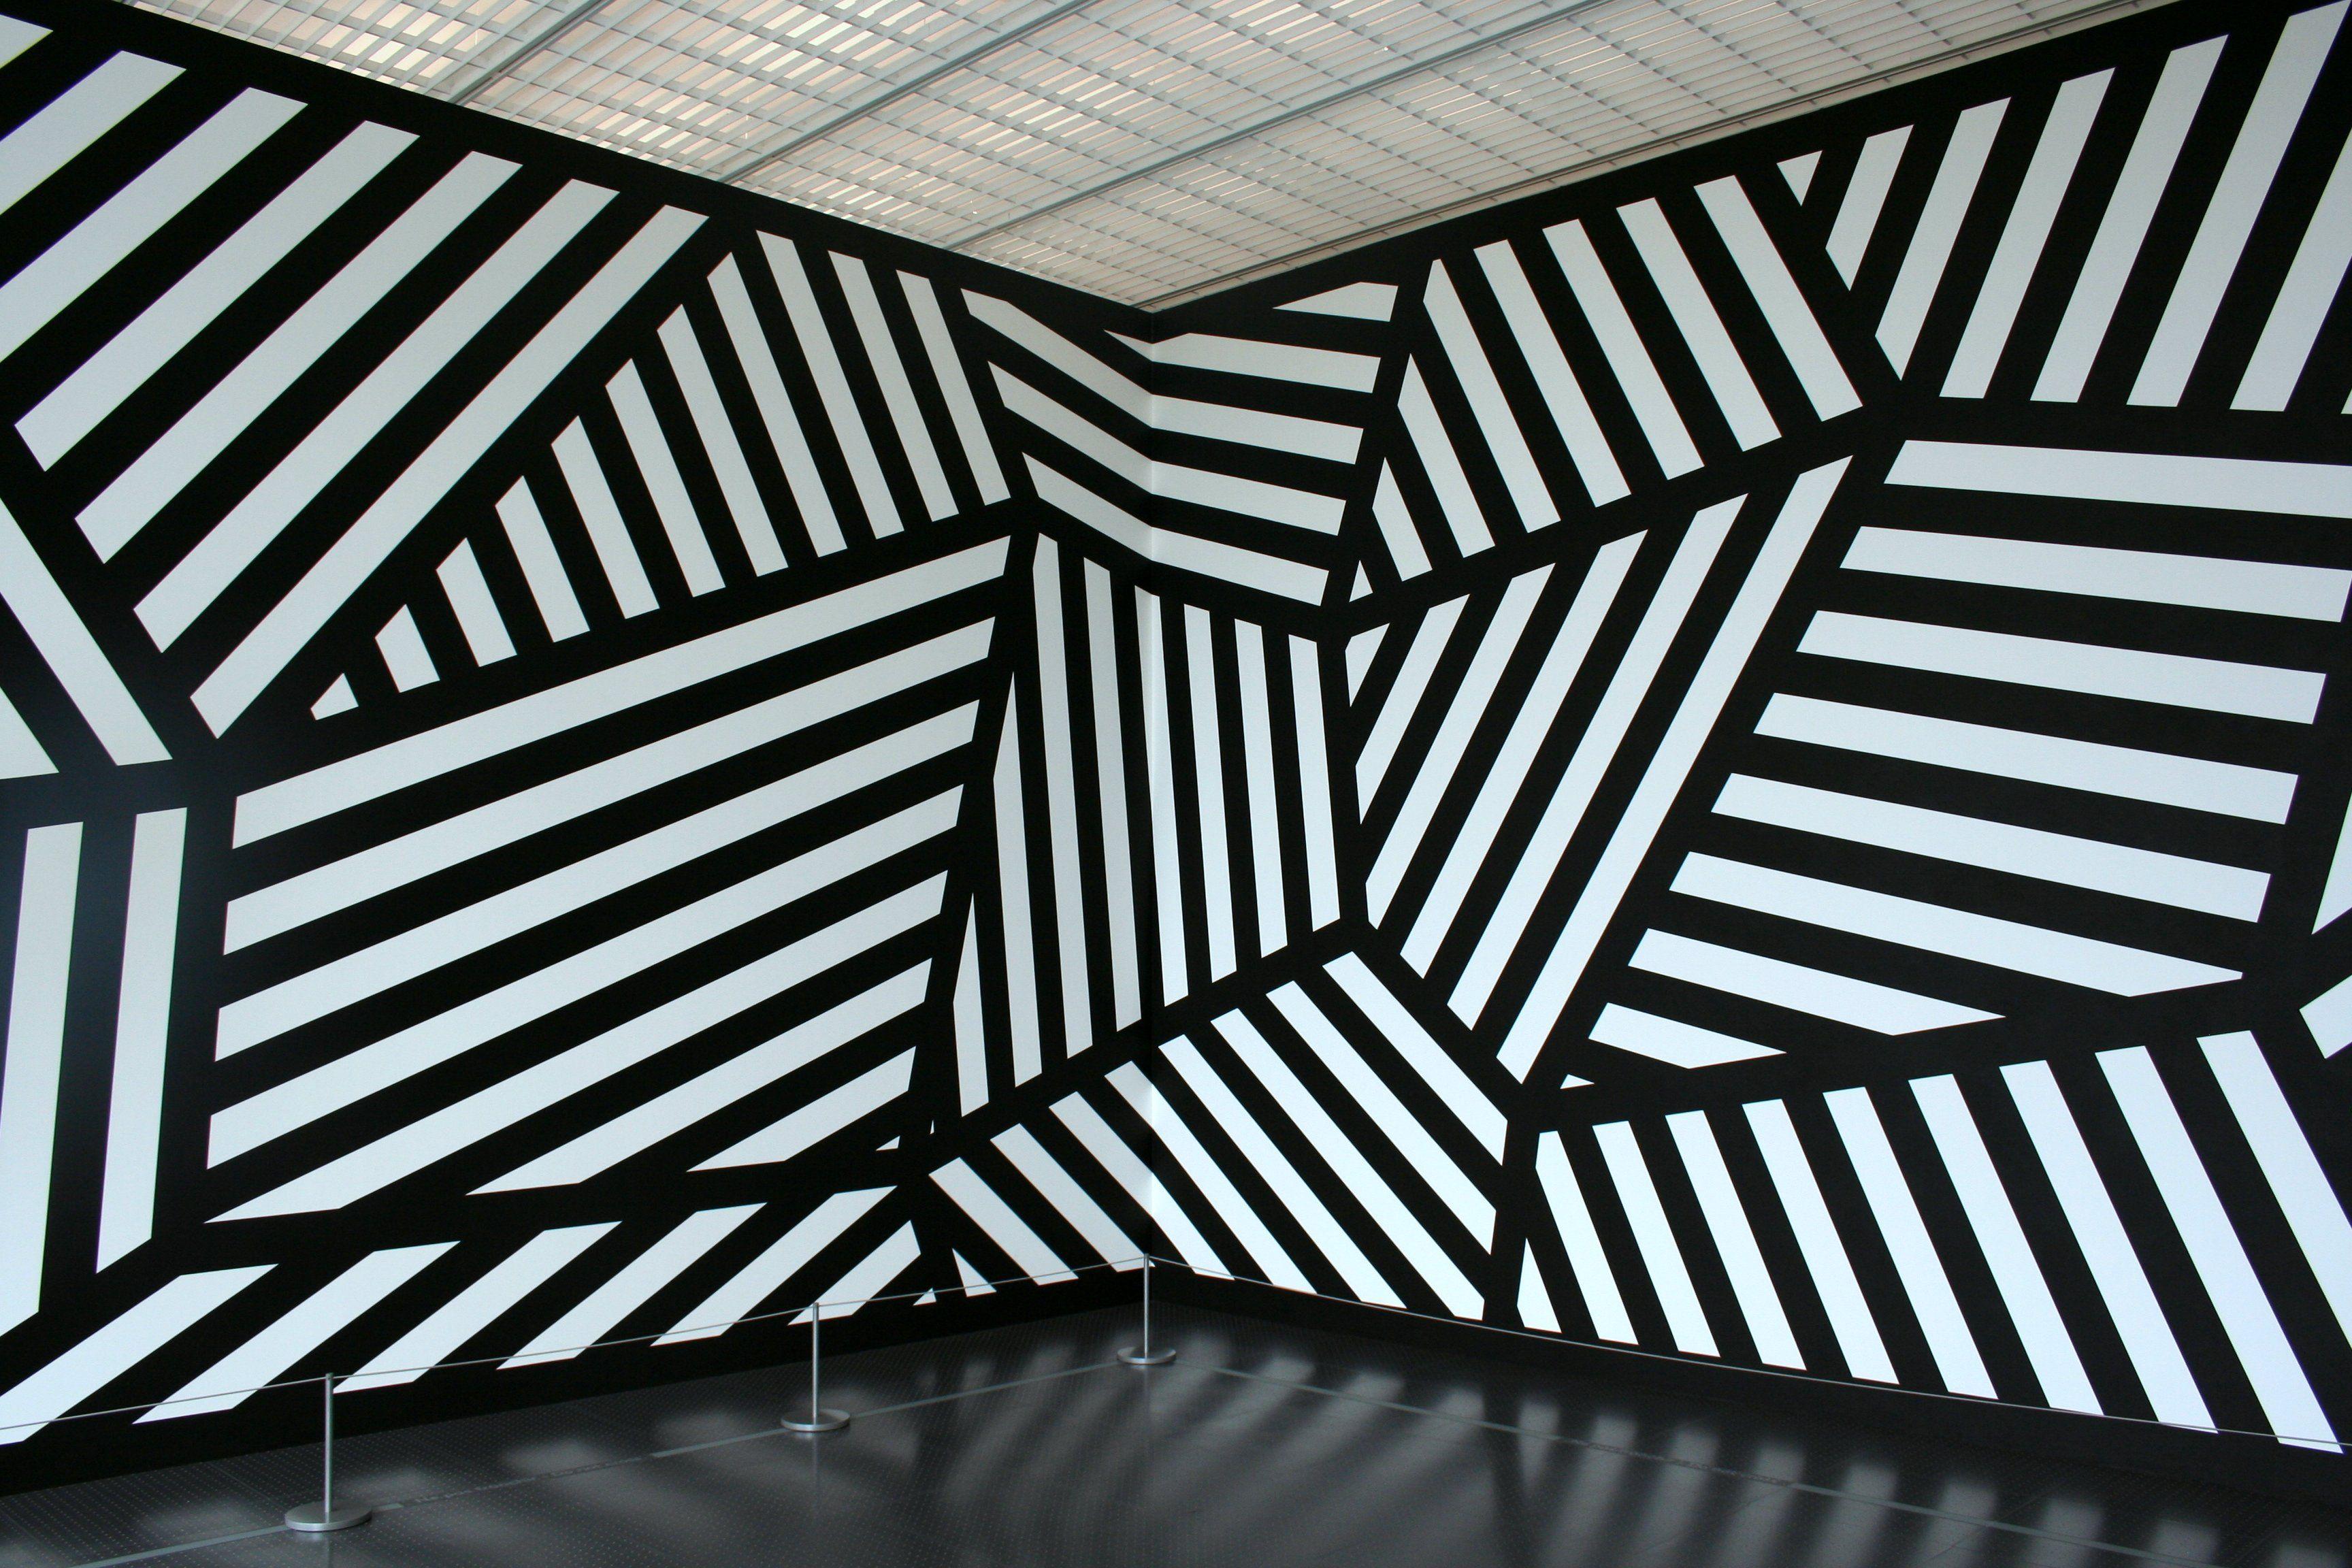 Sol lewitt pompidou metz 1342985369 art spaces for Sol lewitt art minimal